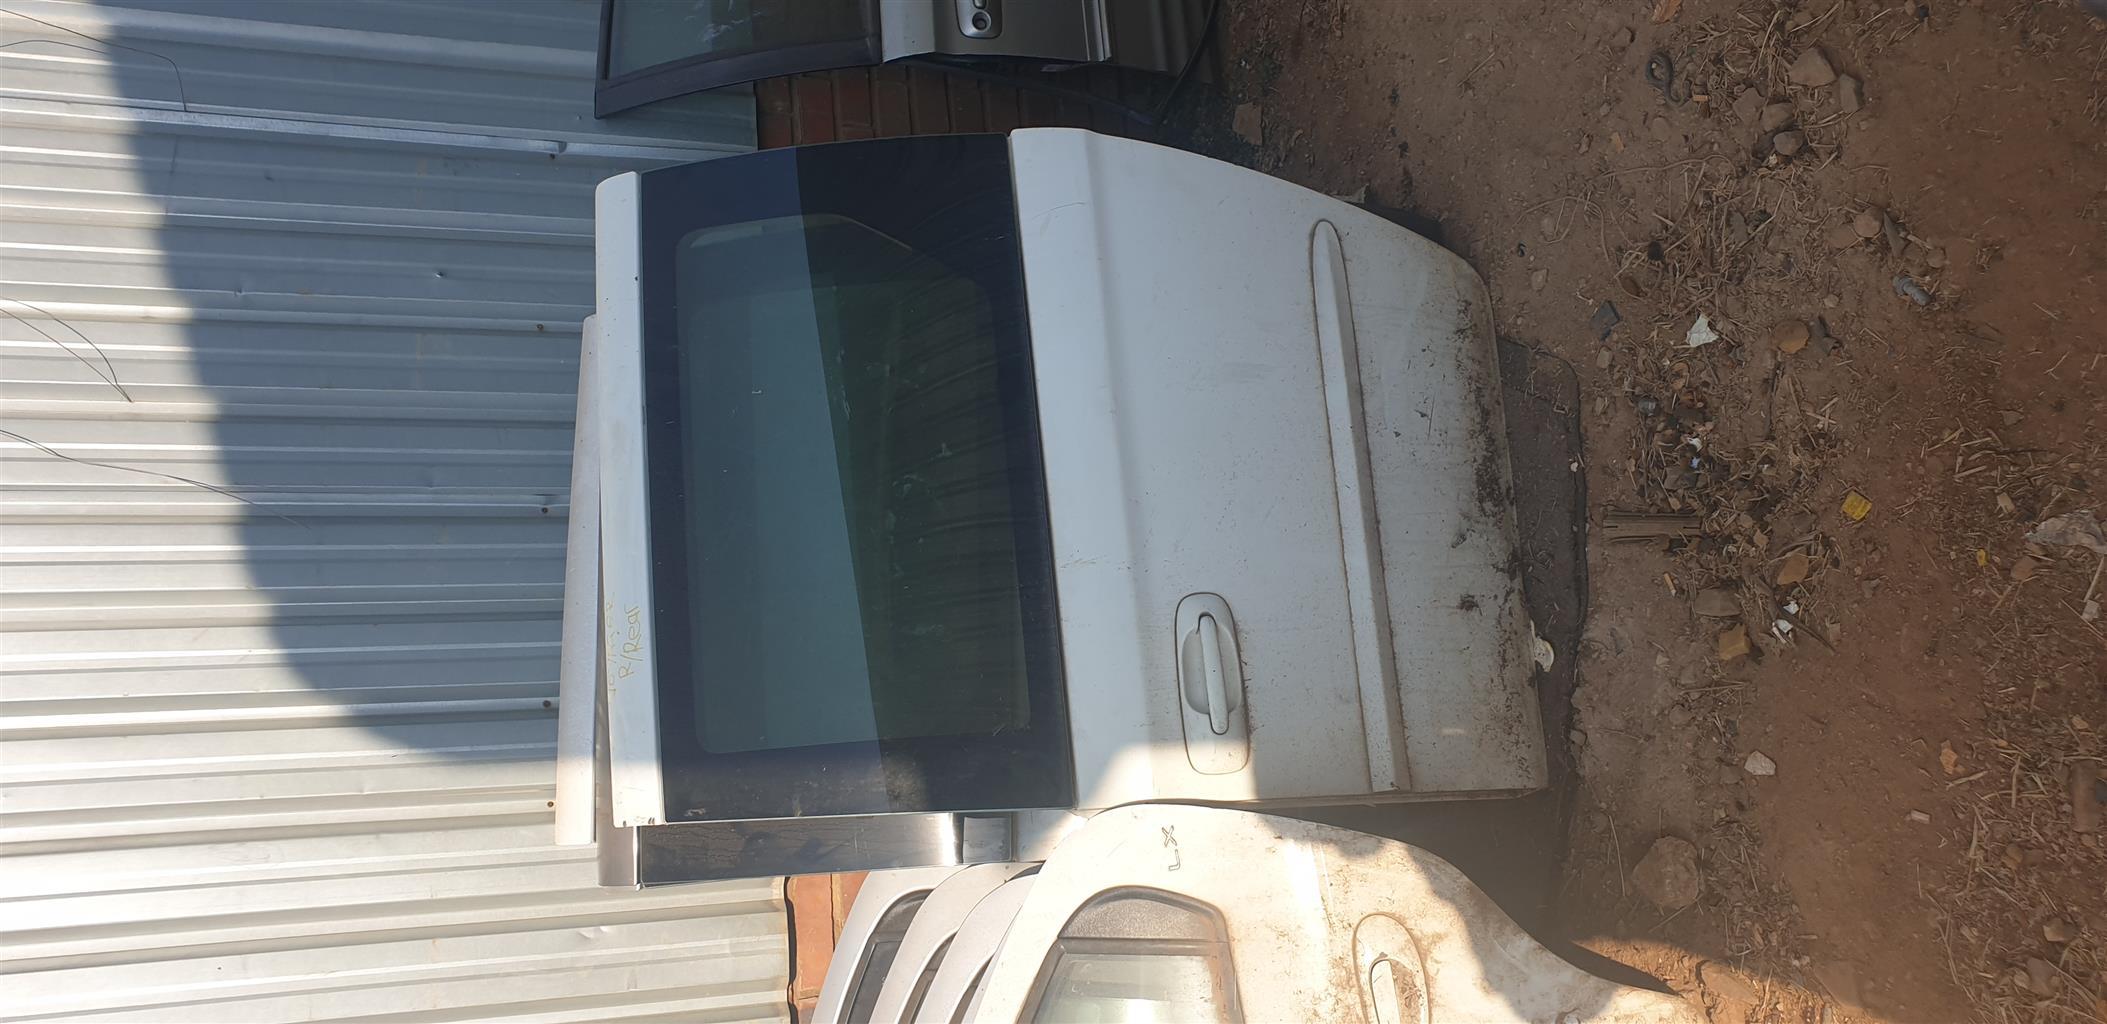 Chrysler Voyager Rear Doors